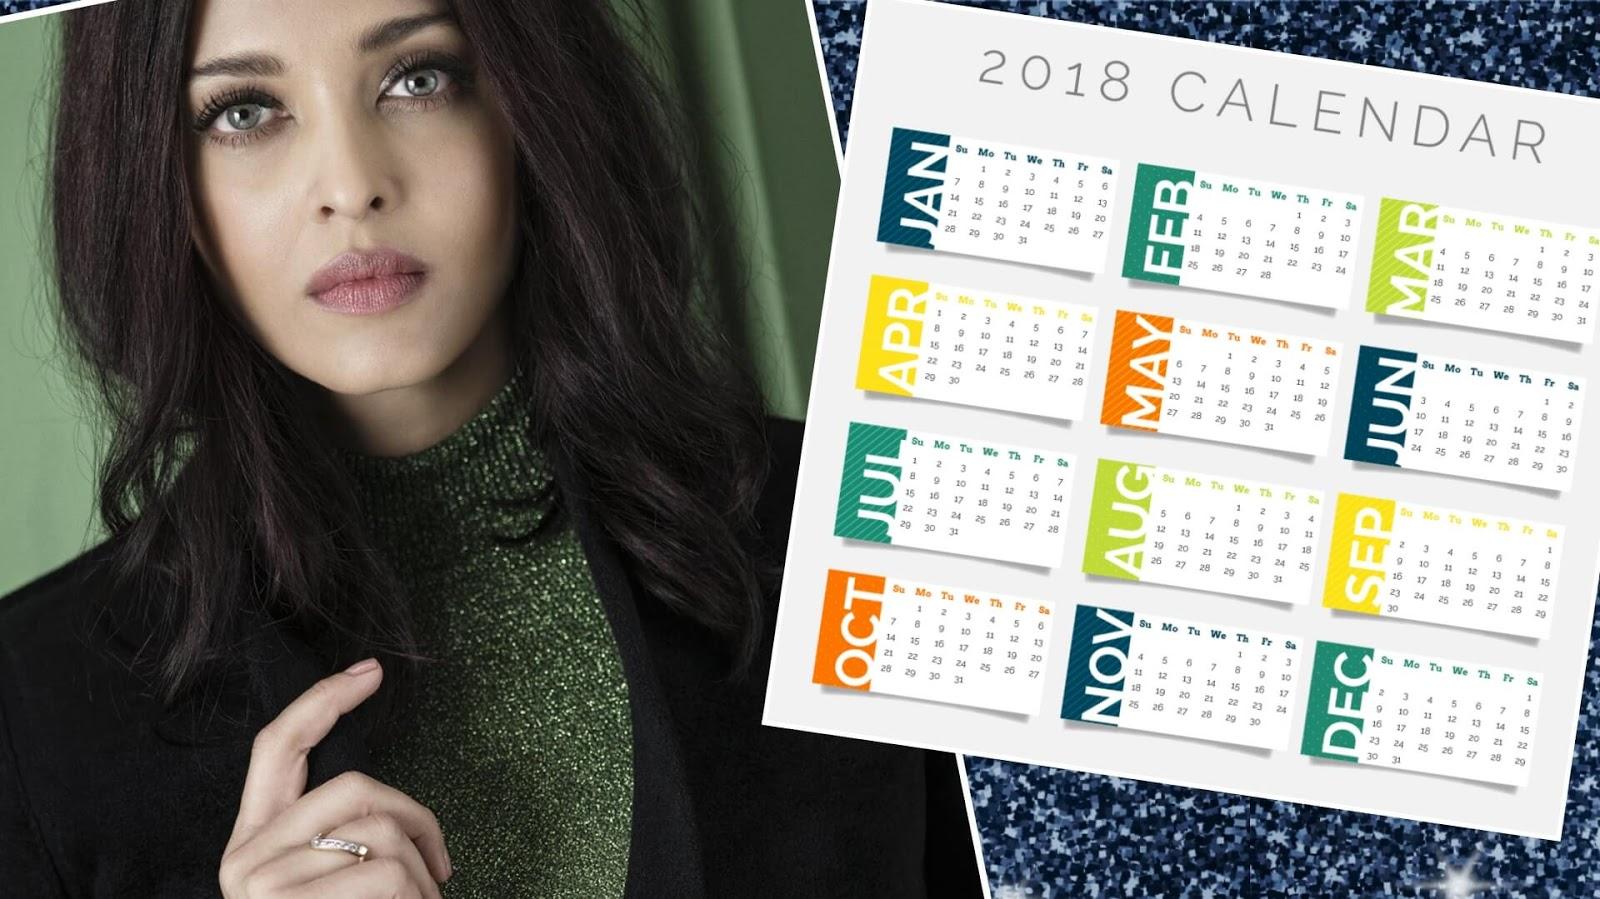 happy-new-year-calendar-2018